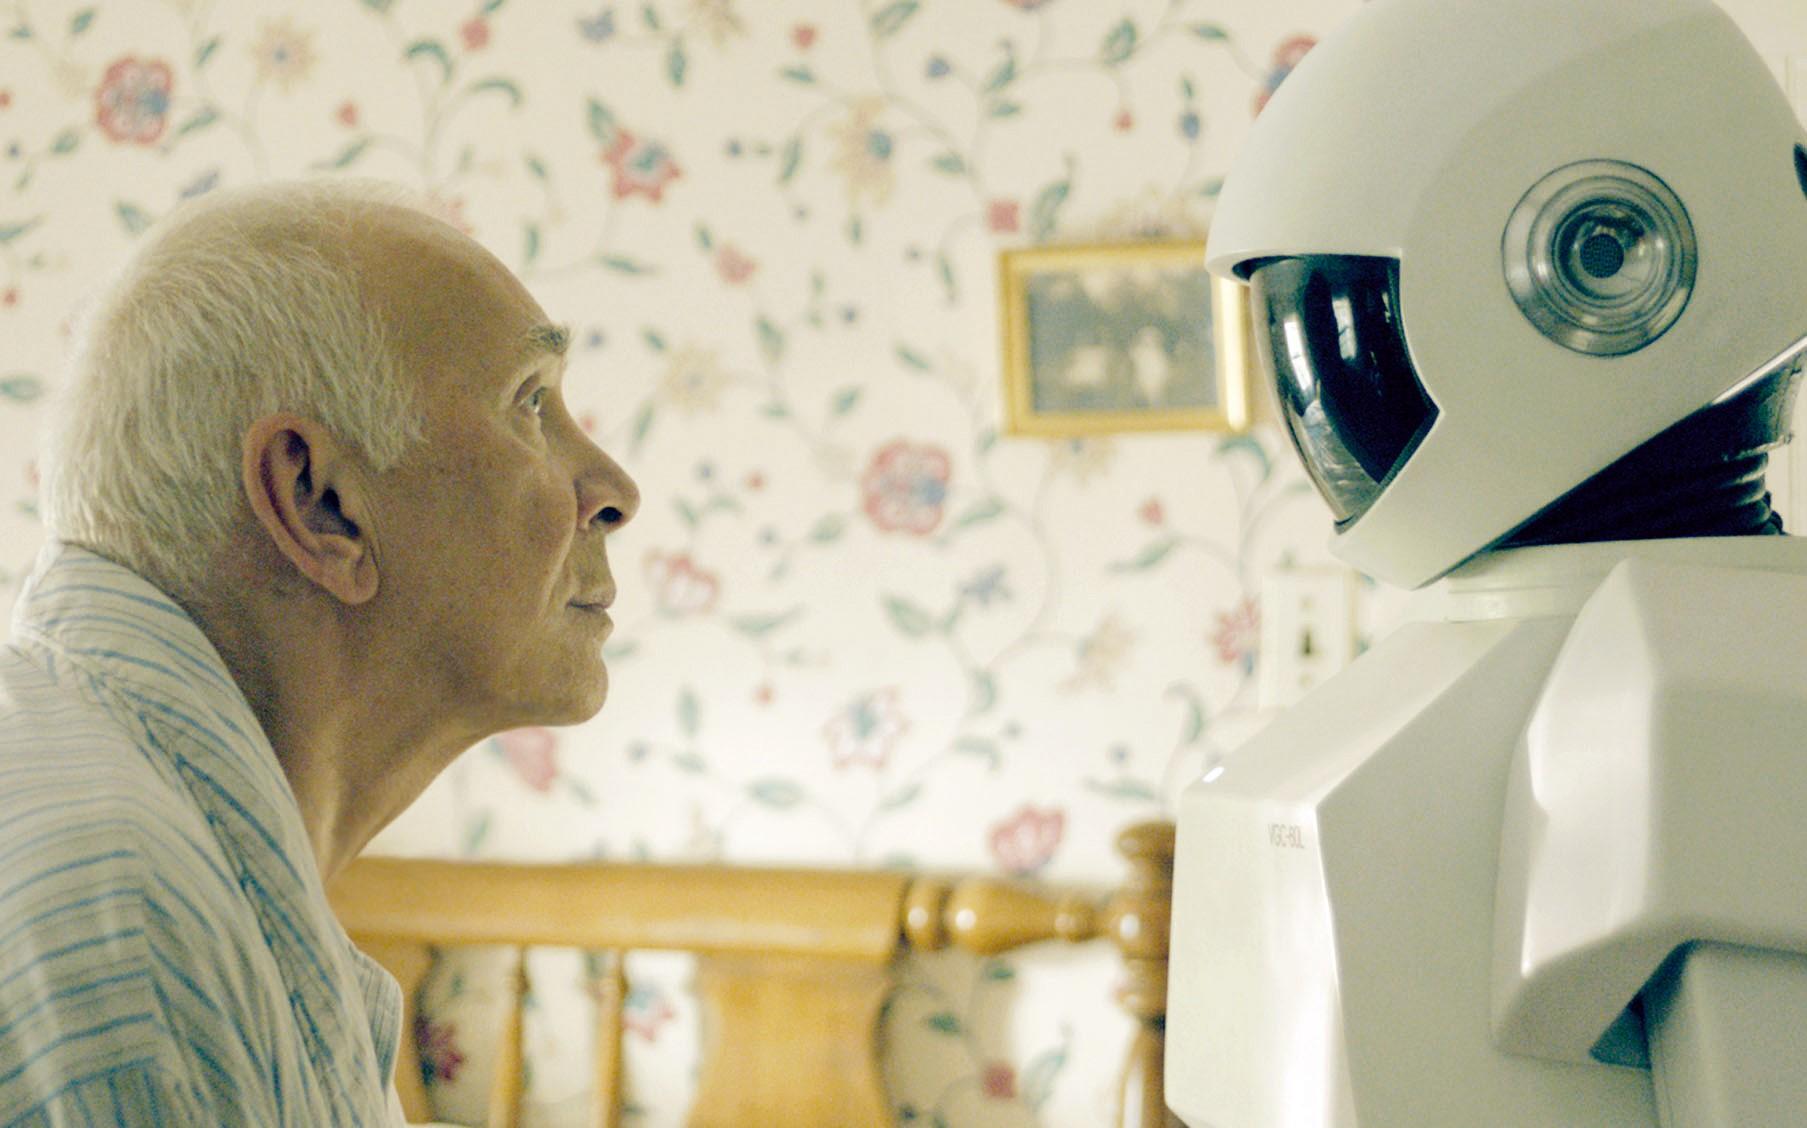 Caregiving Robots